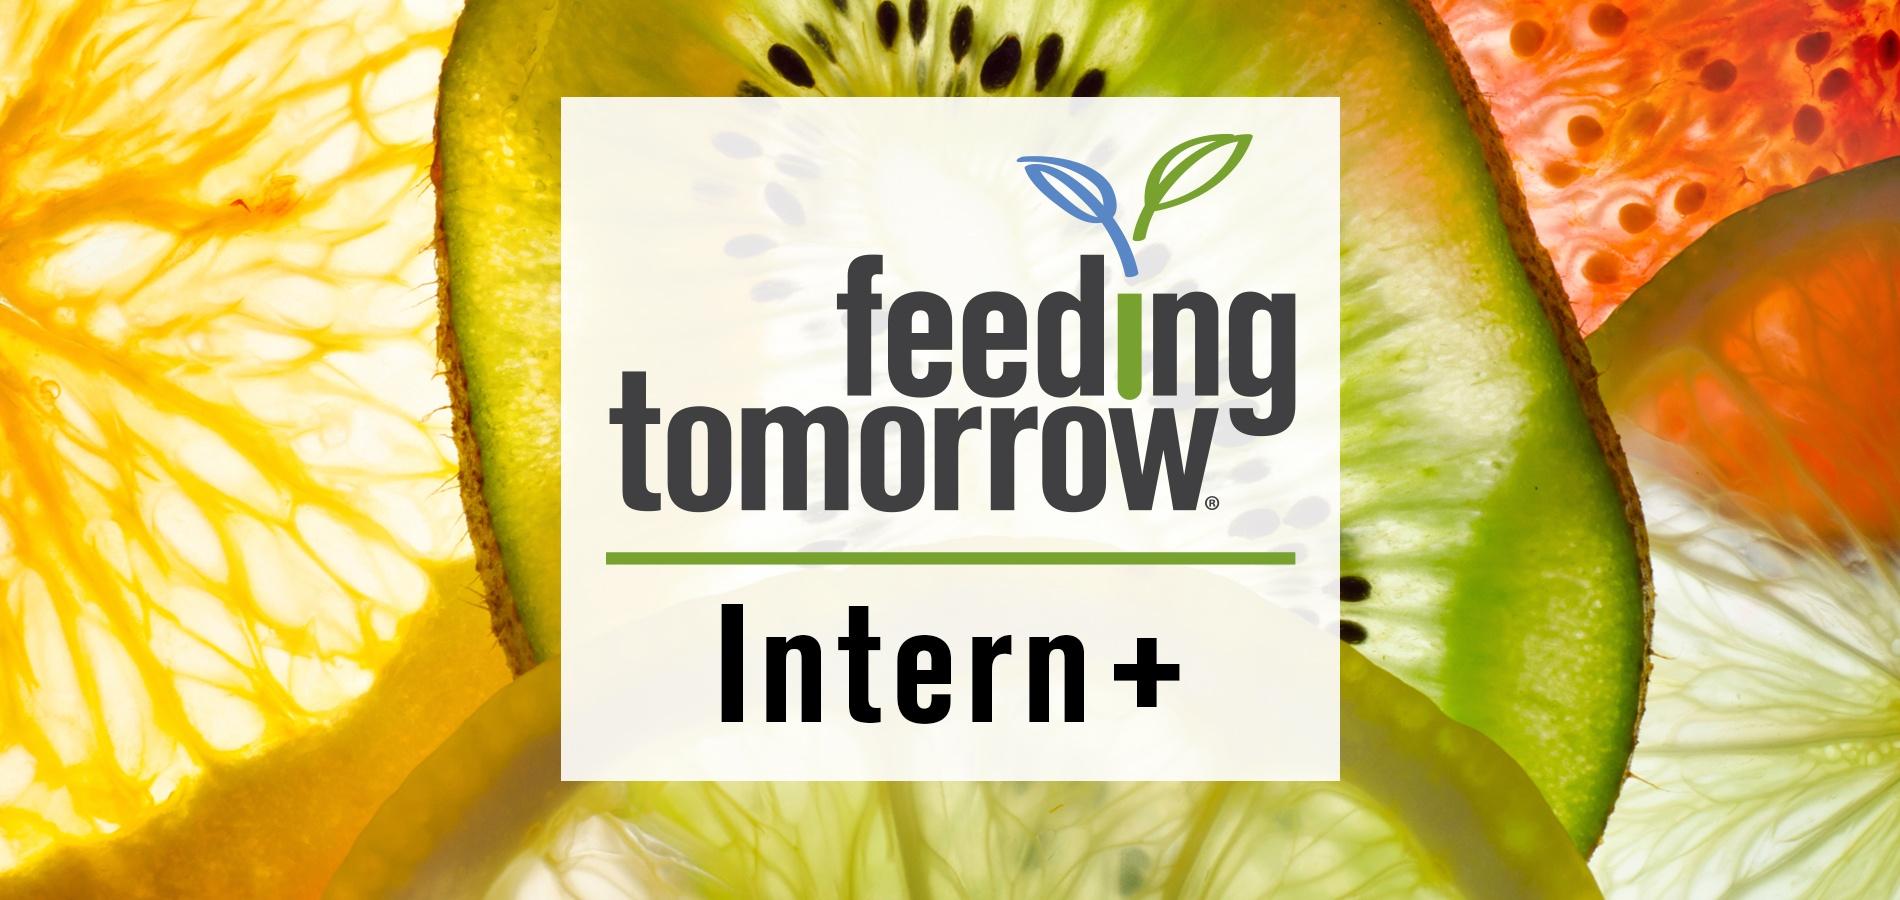 Feeding-Tomorrow-Fruit-backgrounds-InternPlusV1-2